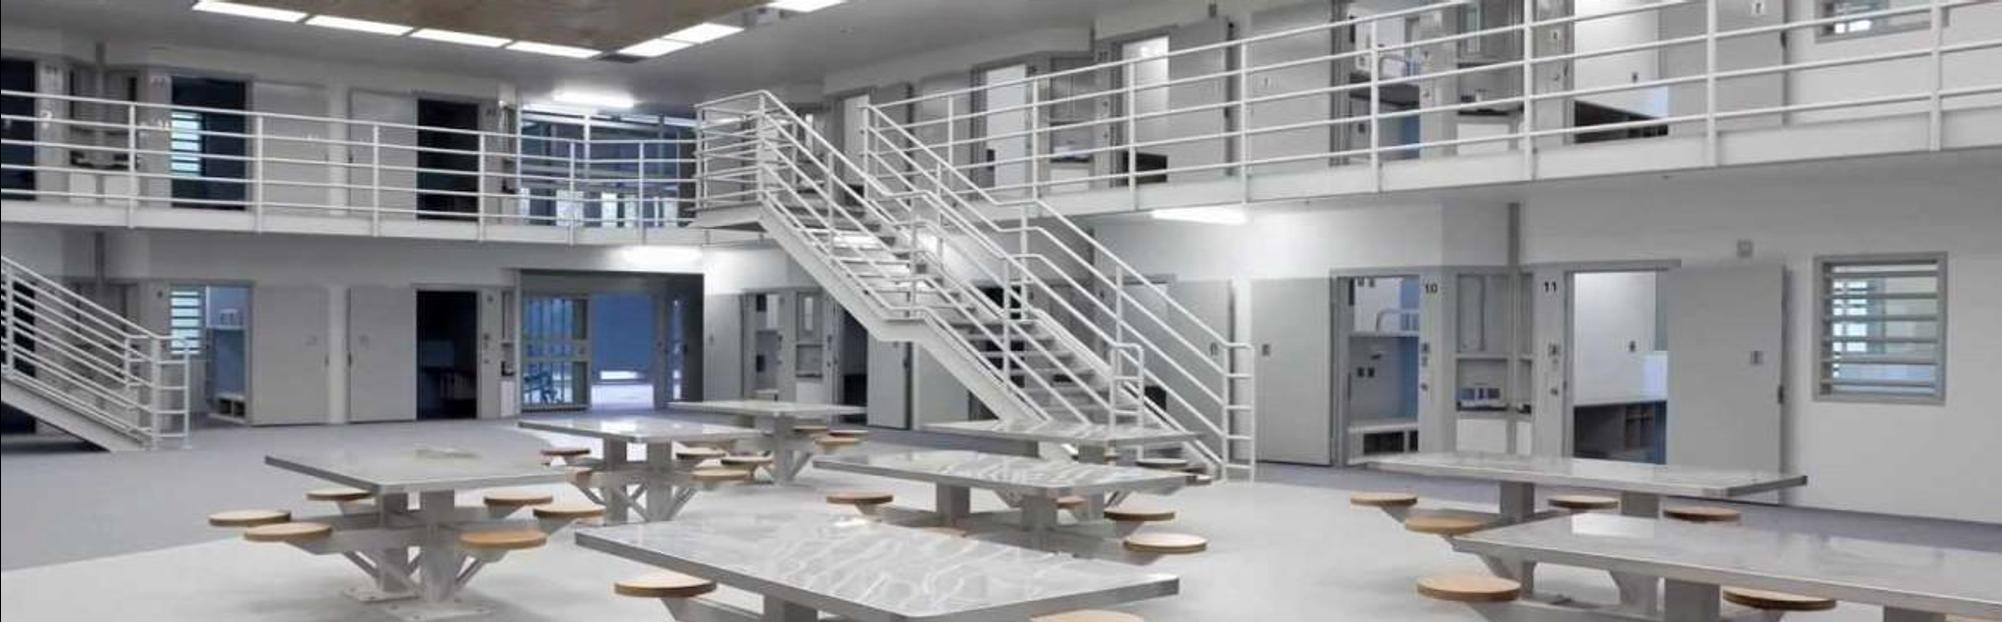 Mt Eden Prison